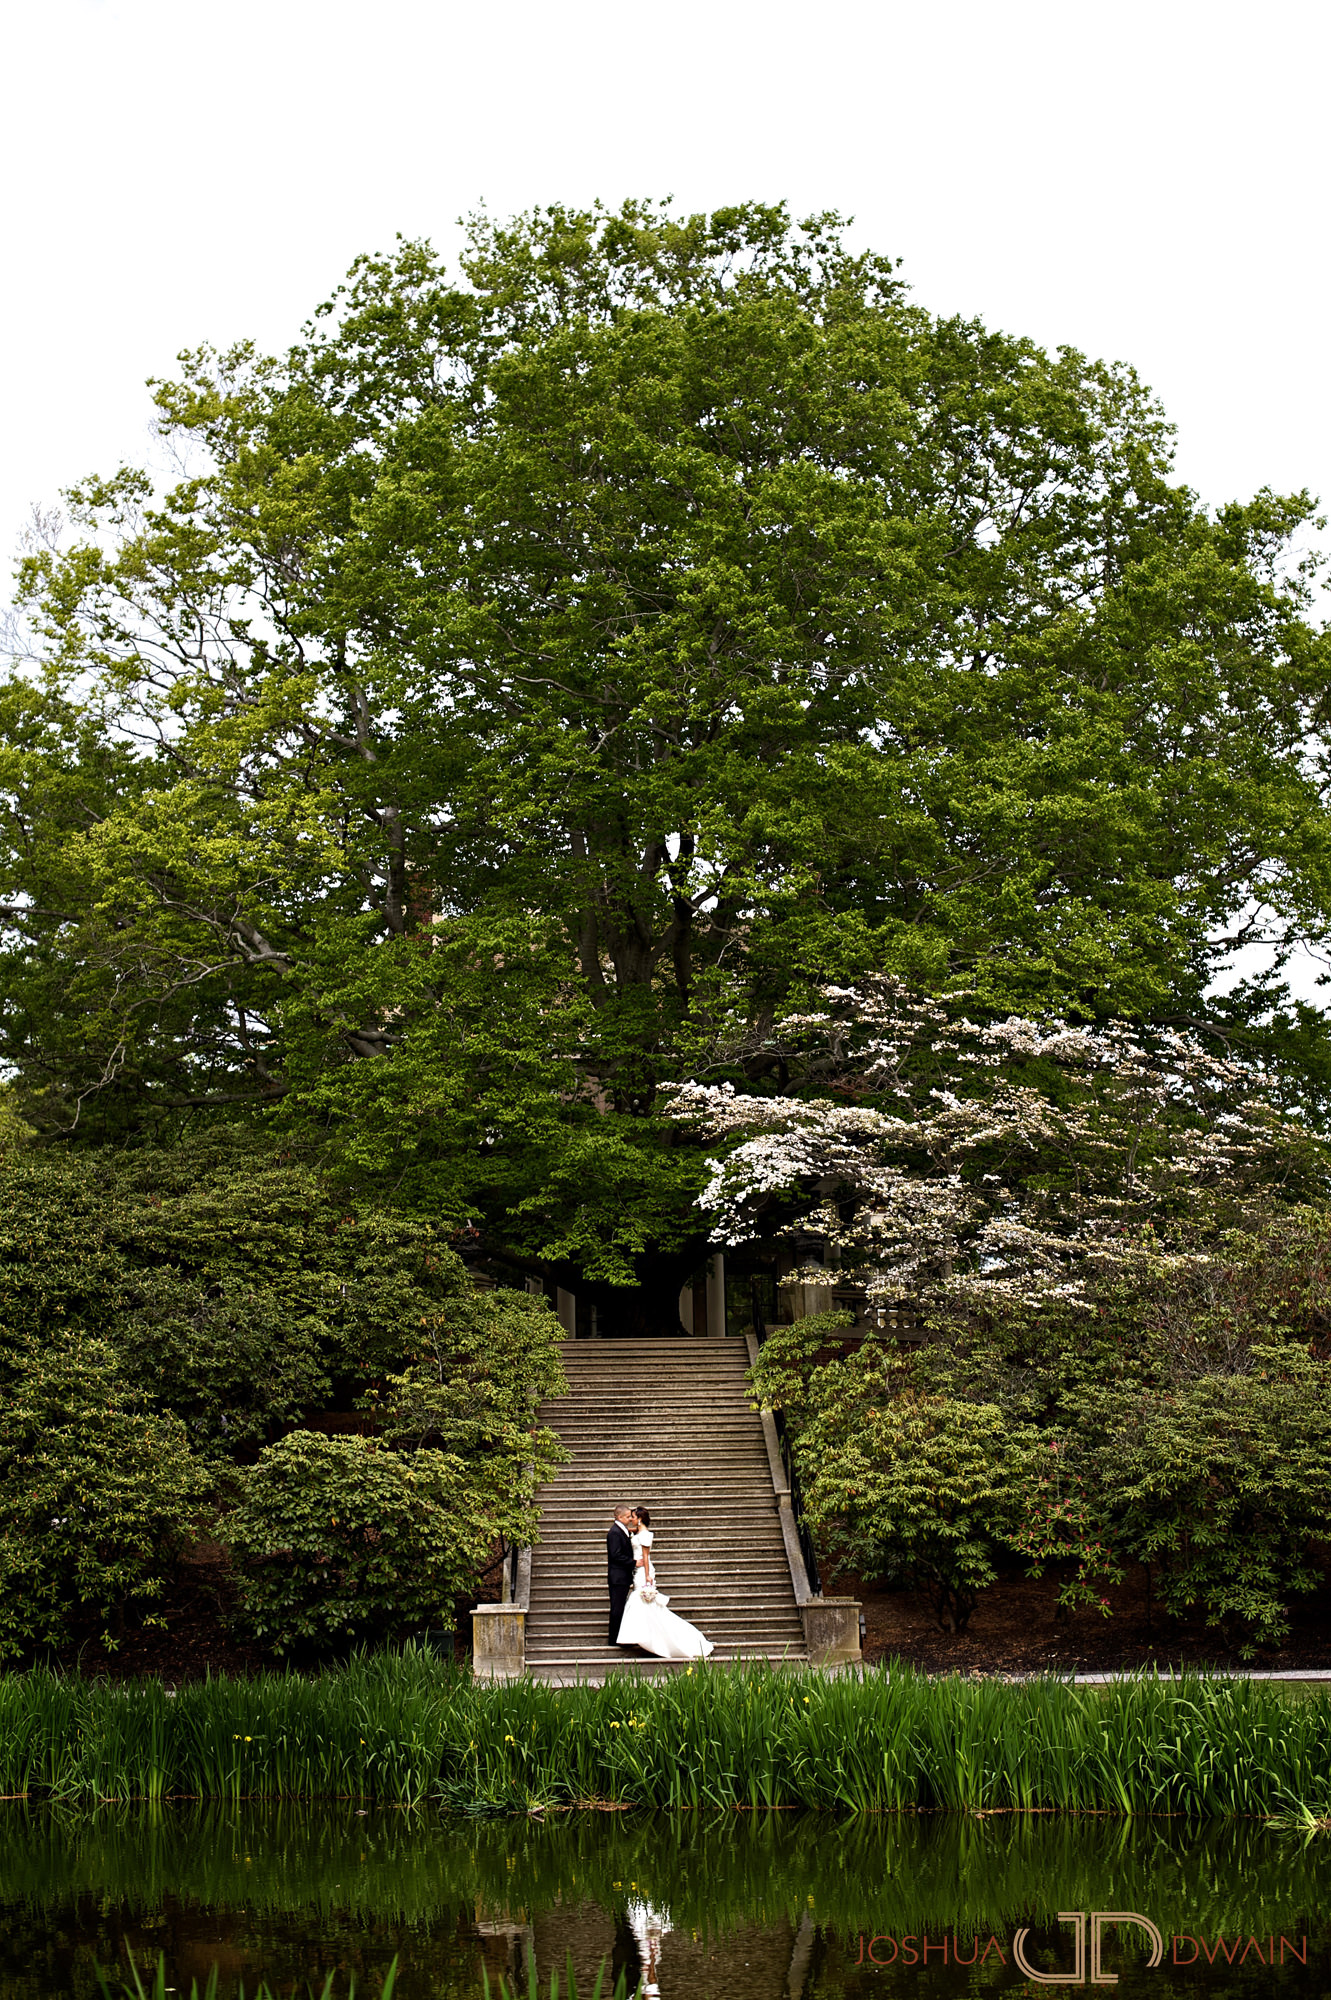 carolina-hector-014-chateau-briandlong-island-new-york-wedding-photographer-joshua-dwain-2011-05-13_ch_0401